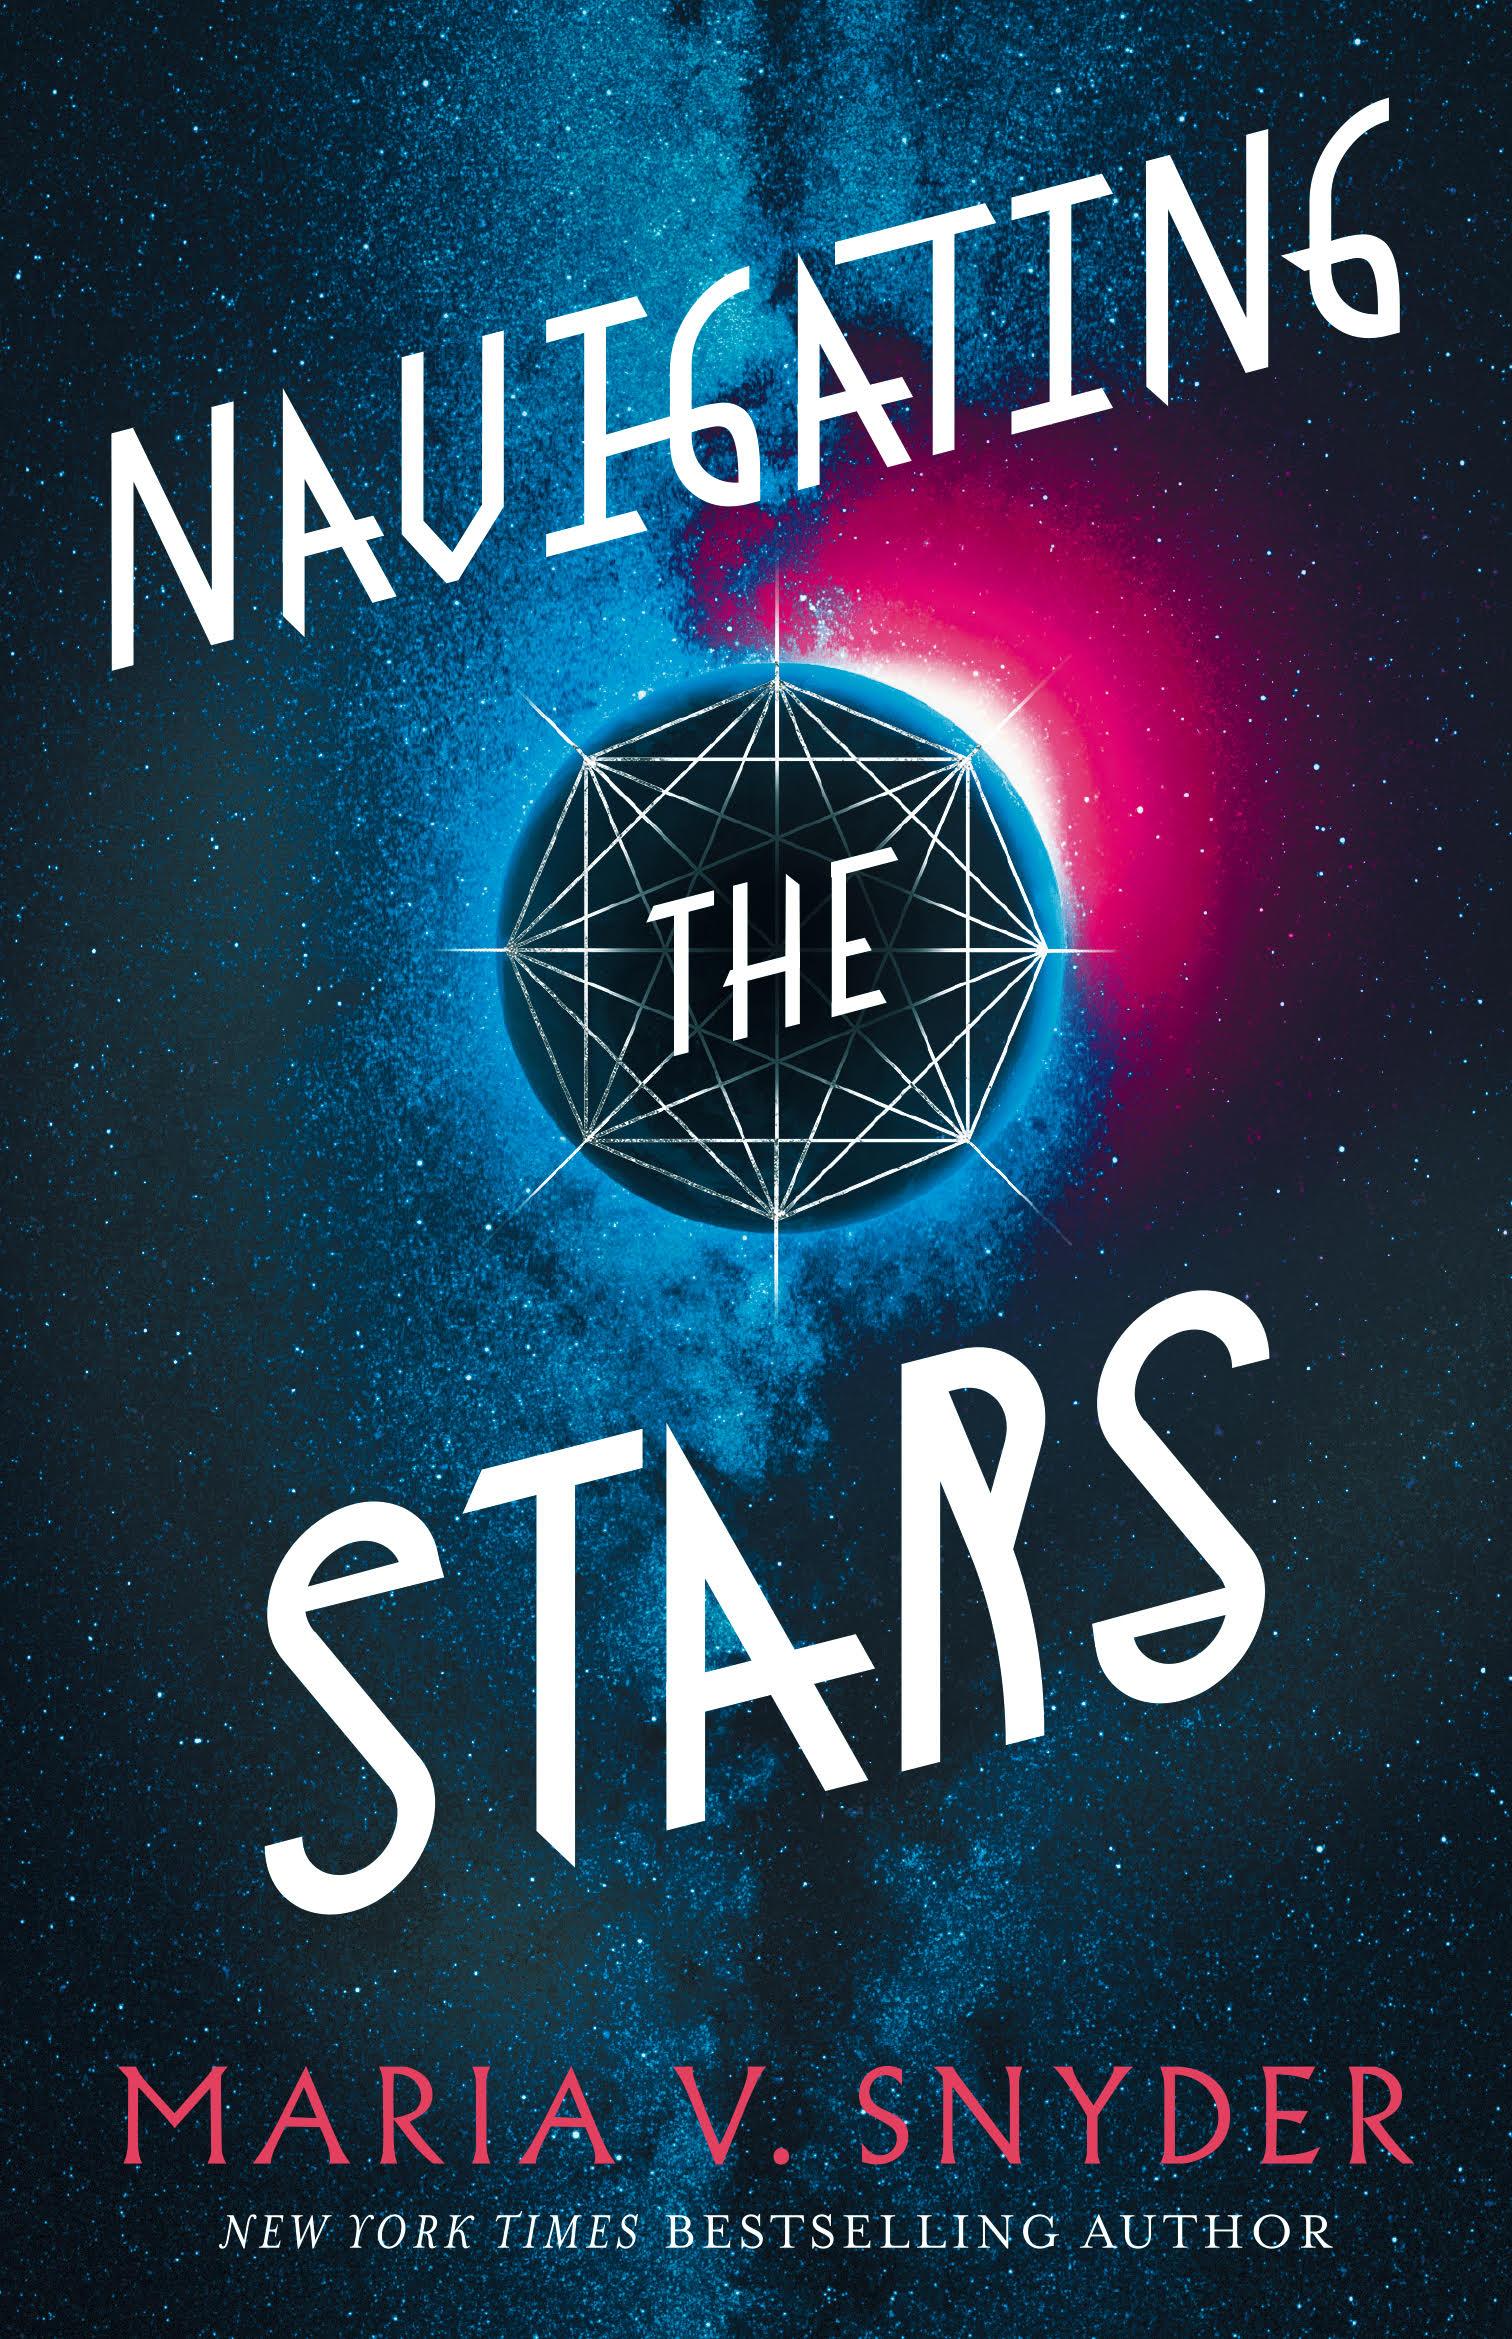 Blog Tour & Giveaway: Navigating the Stars by Maria V. Snyder